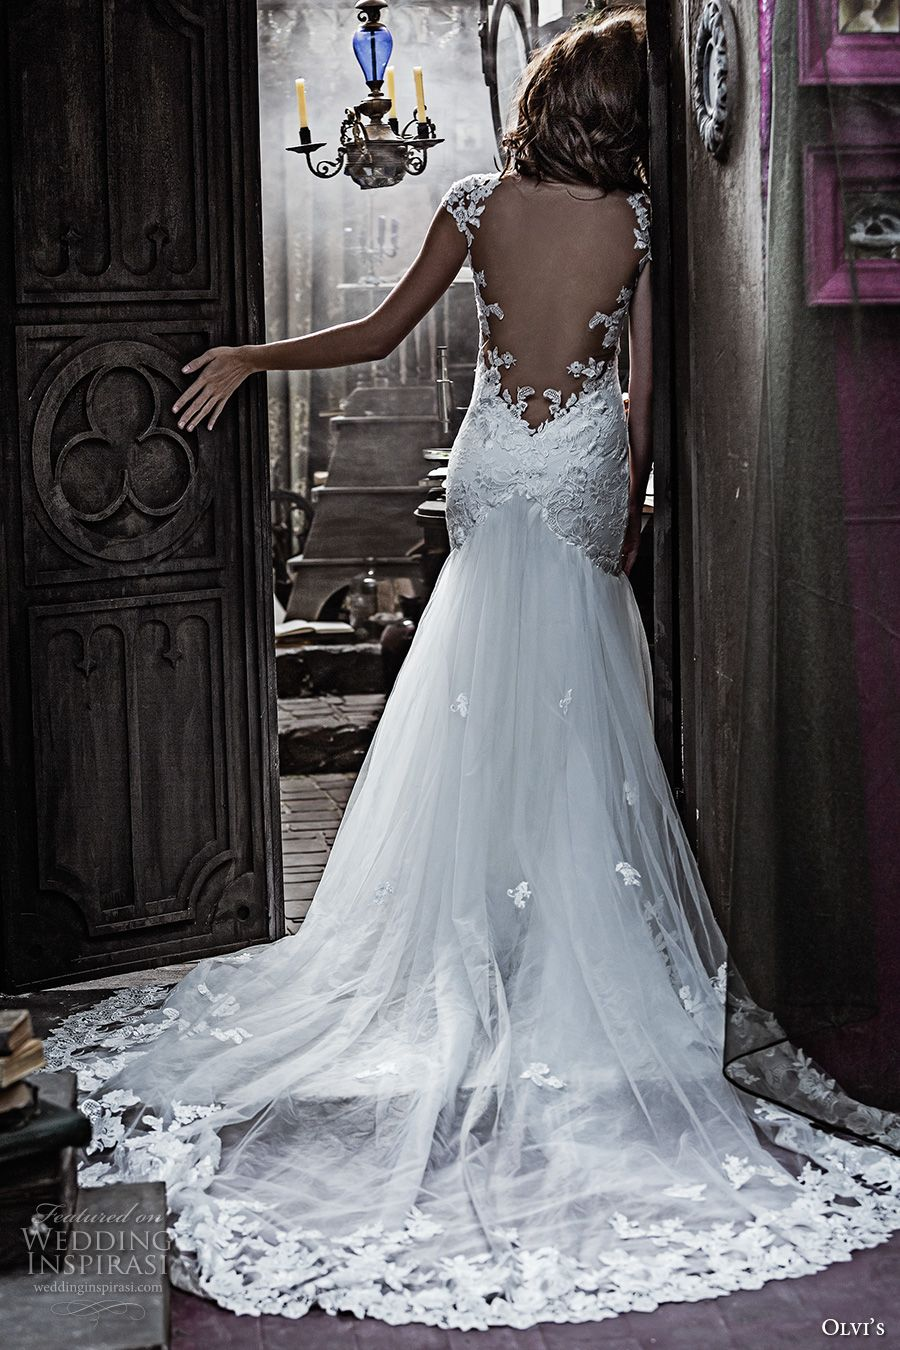 Olga Yermoloff 2017 Couture Wedding Dresses | Couture bridal, Chapel ...